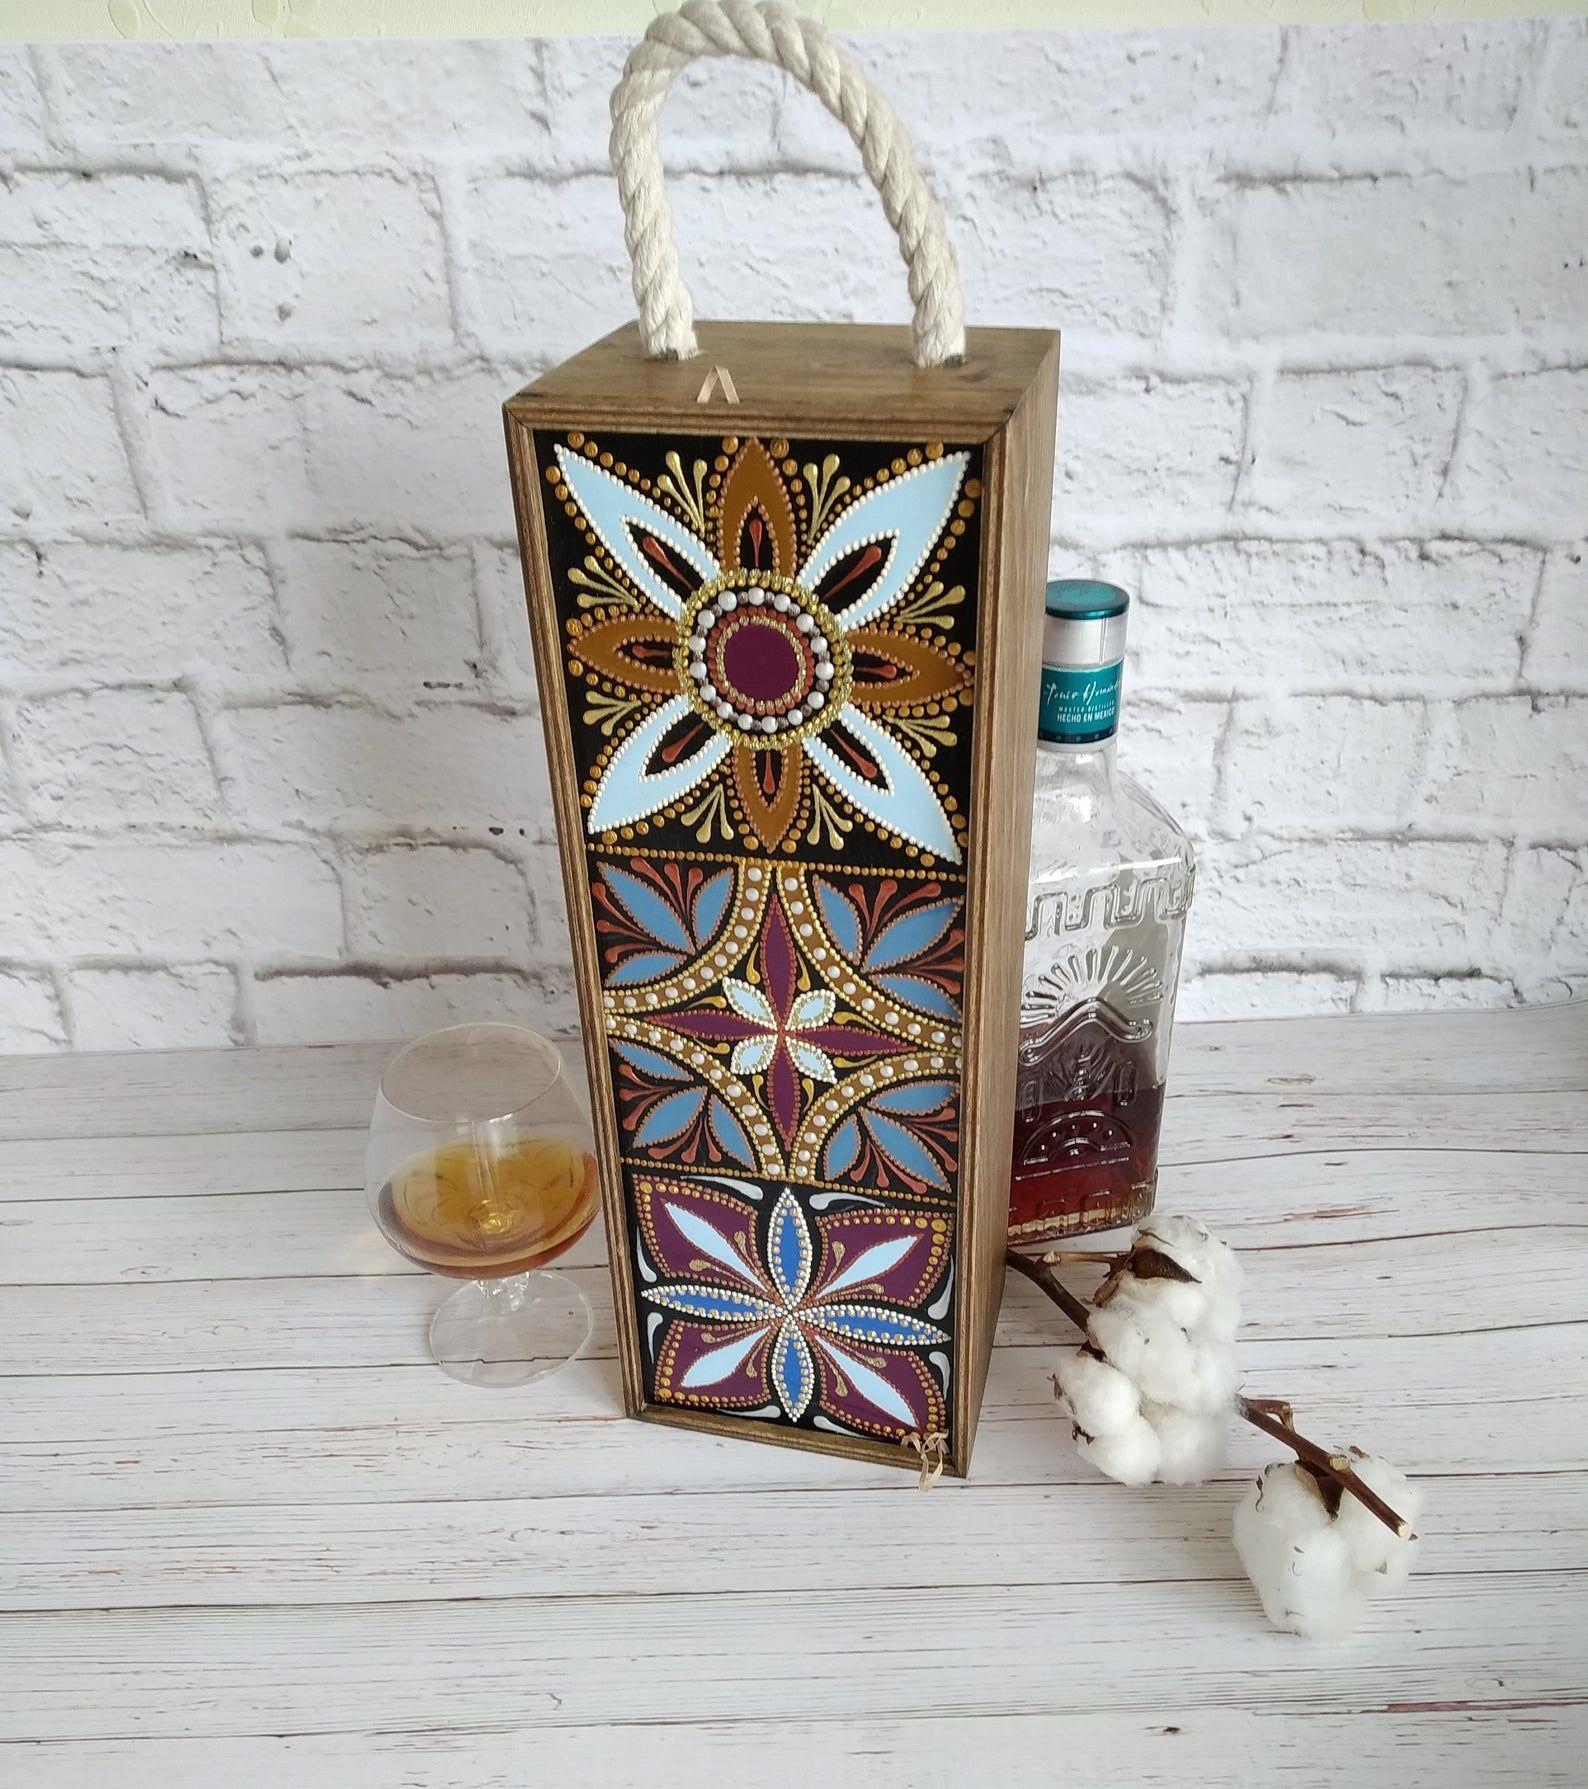 Park Art My WordPress Blog_Housewarming Gift Box With Wine